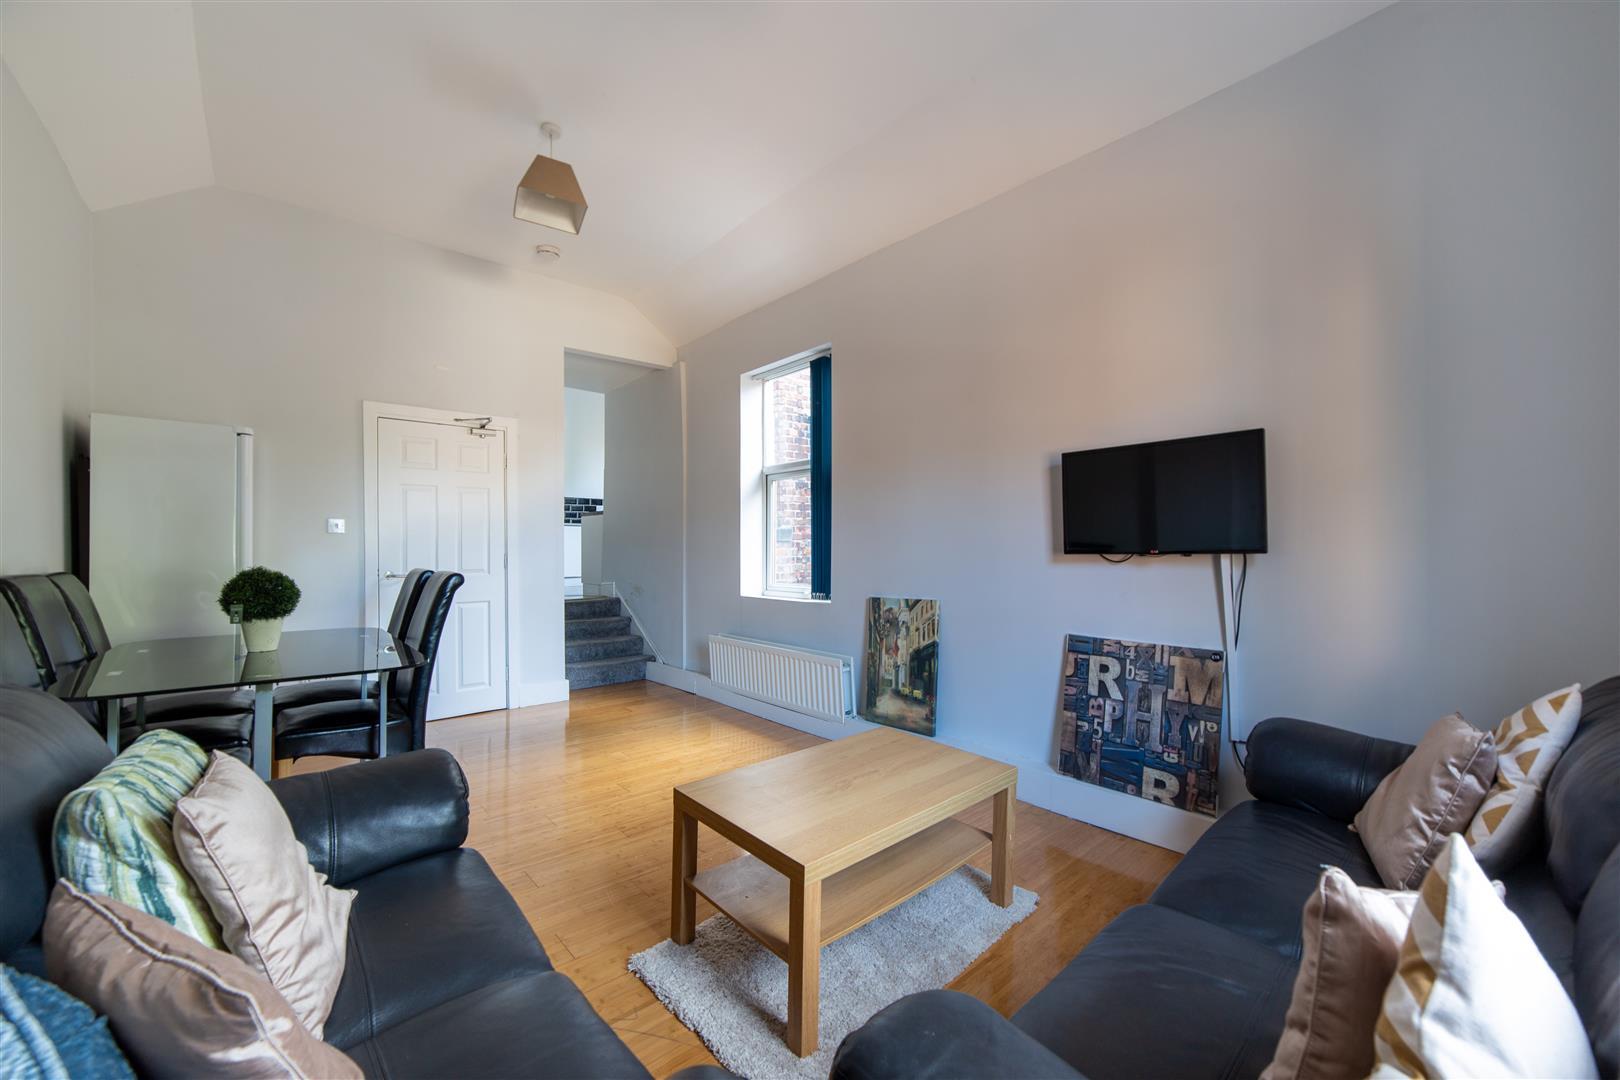 5 bed maisonette to rent in Newcastle Upon Tyne, NE6 5HL 0